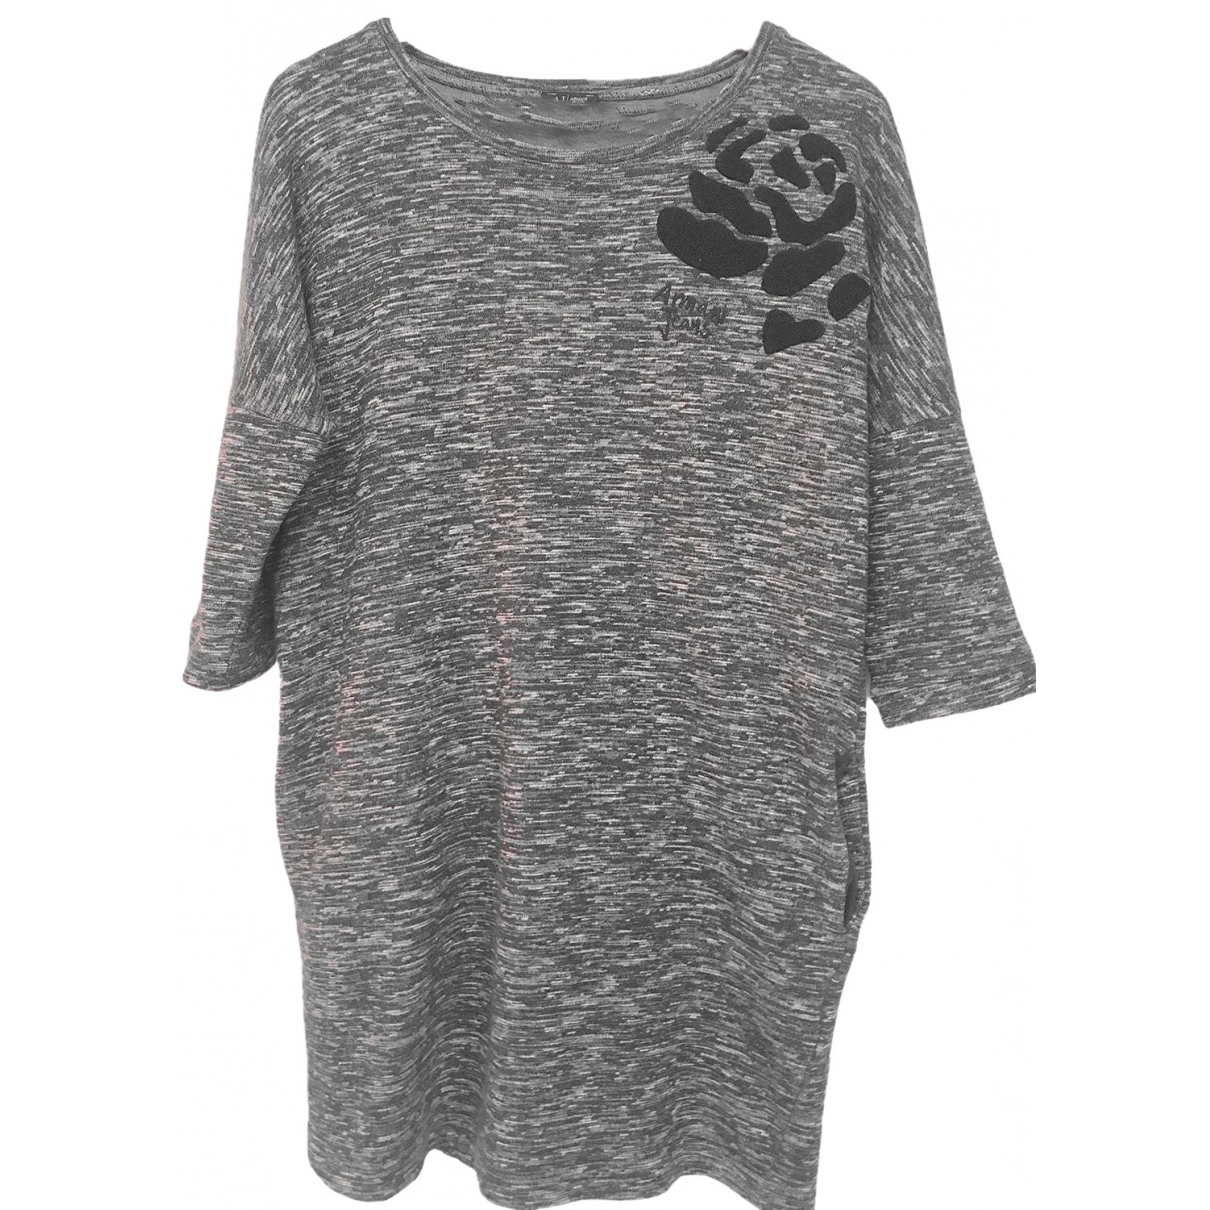 Armani Jeans \N Cotton dress for Women 36 FR